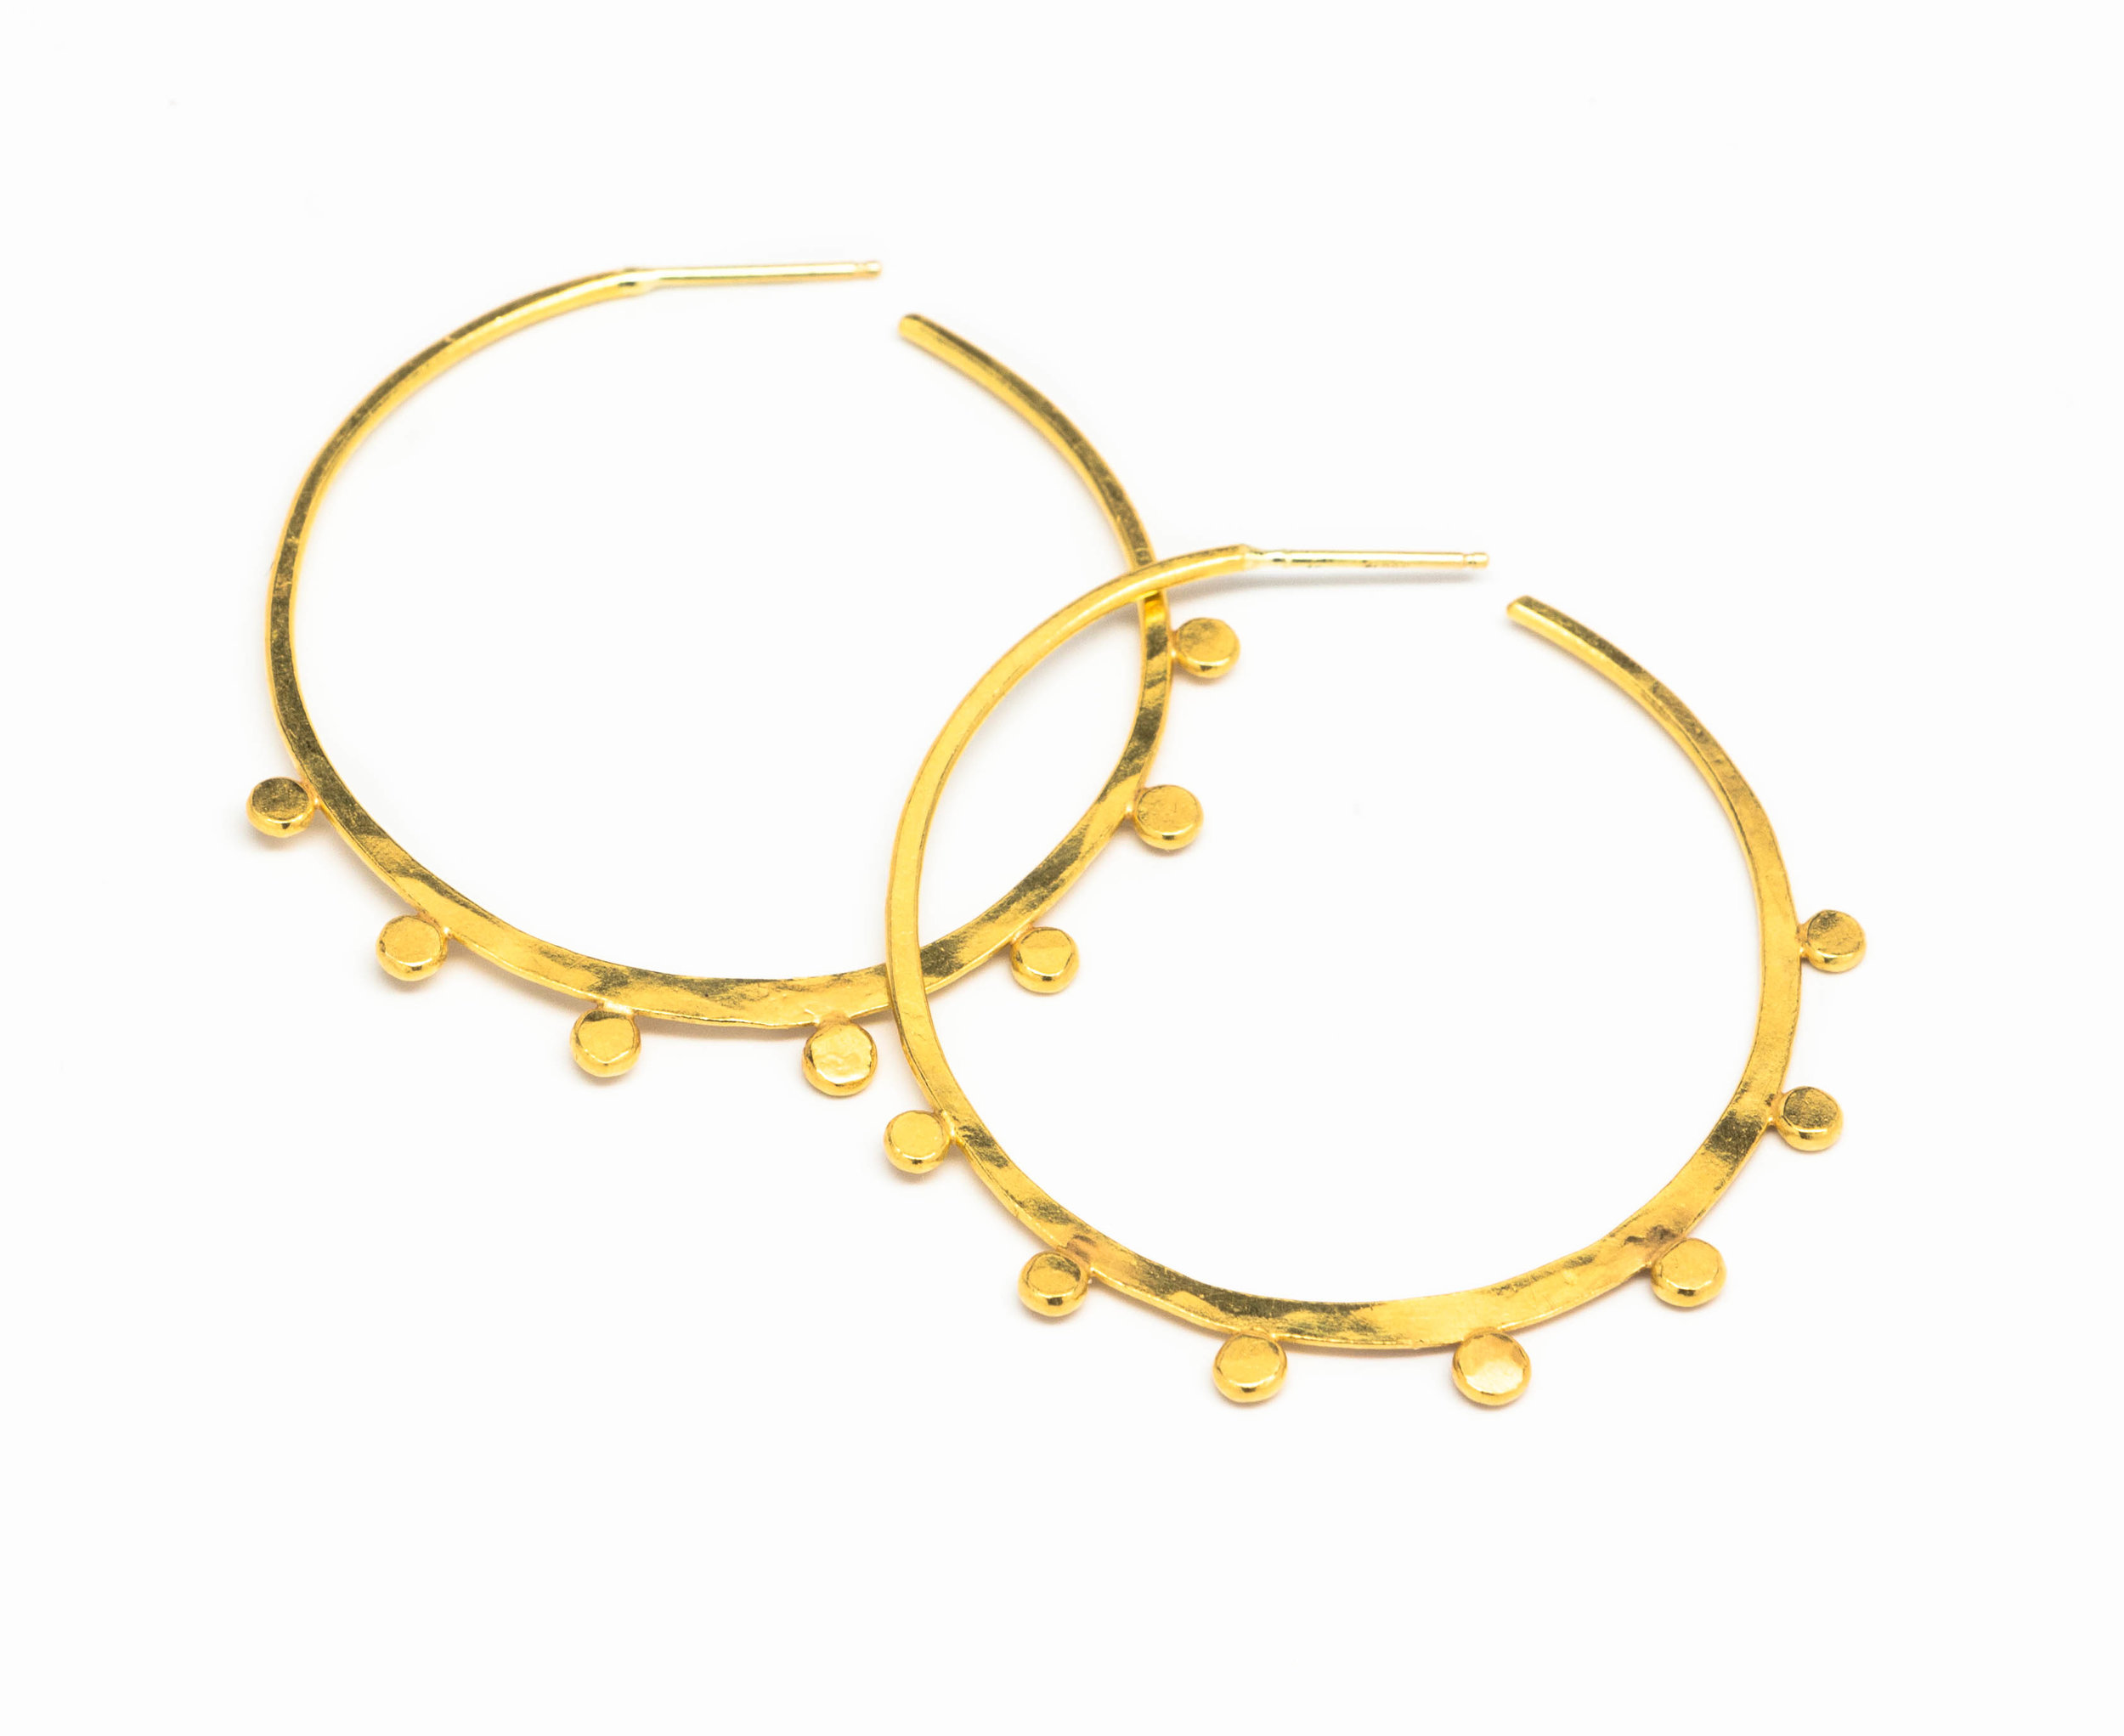 dec21 jewelry5-592.jpg